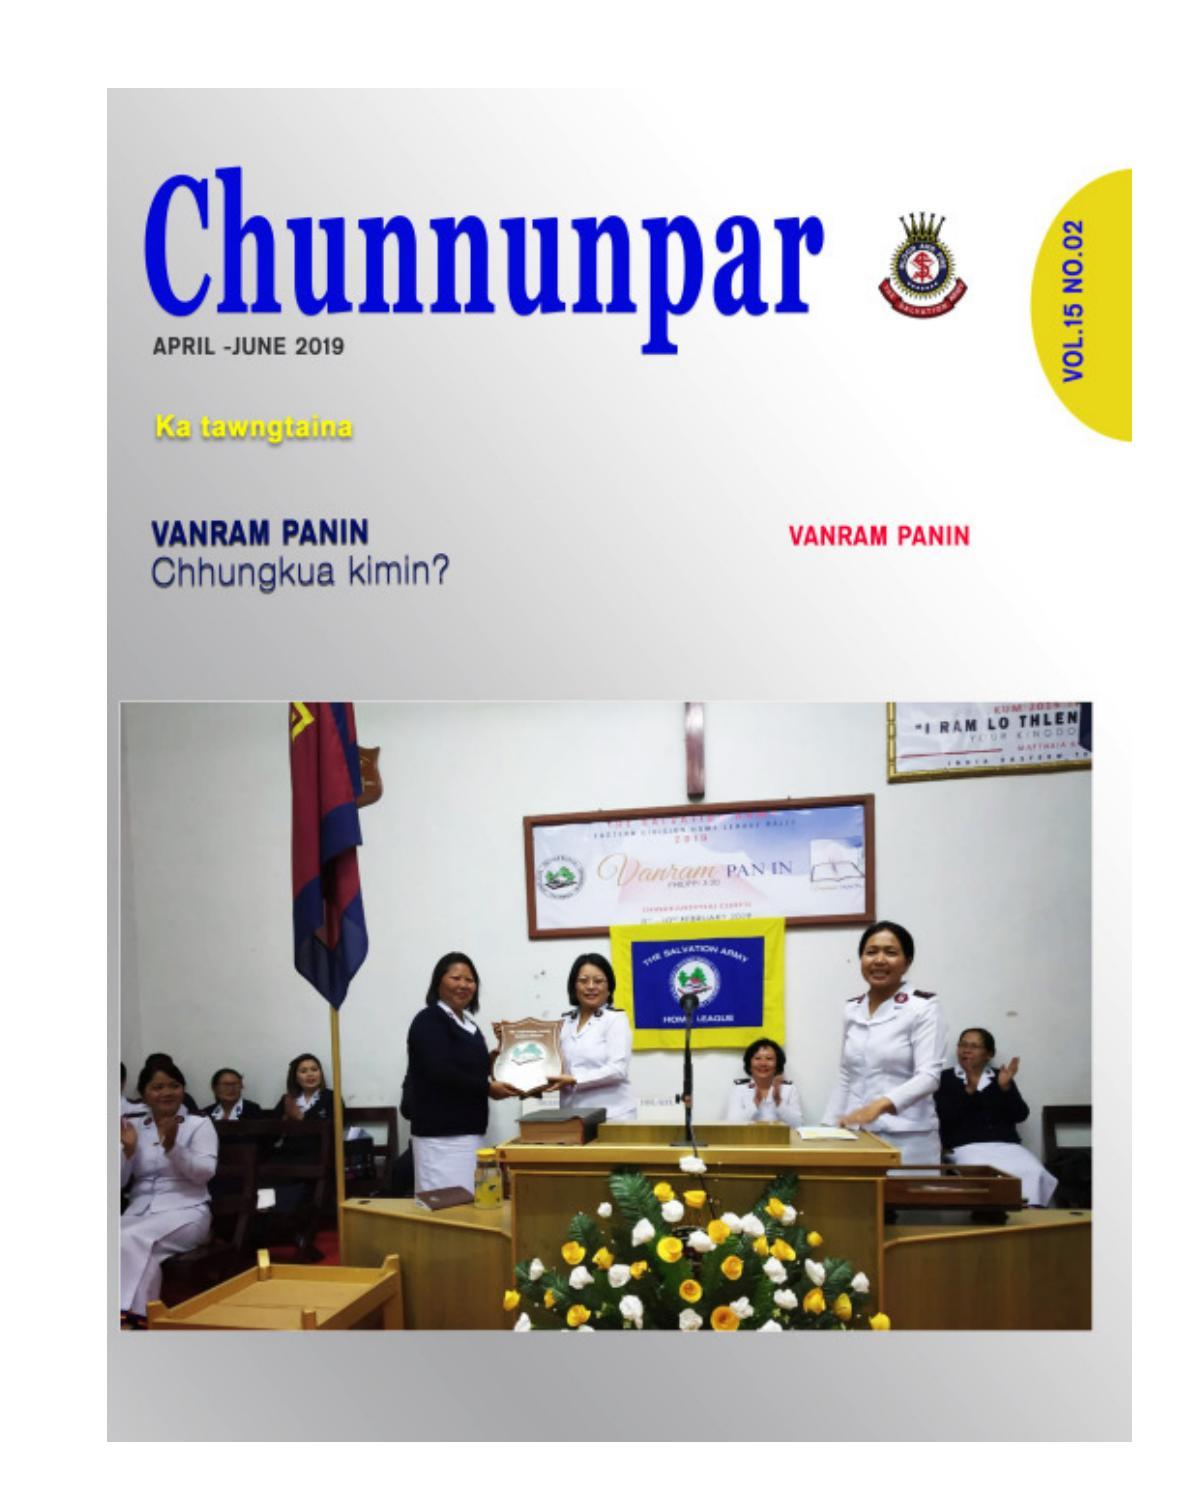 Chunnunpar April - June 2019 by SalvationArmyIET - issuu